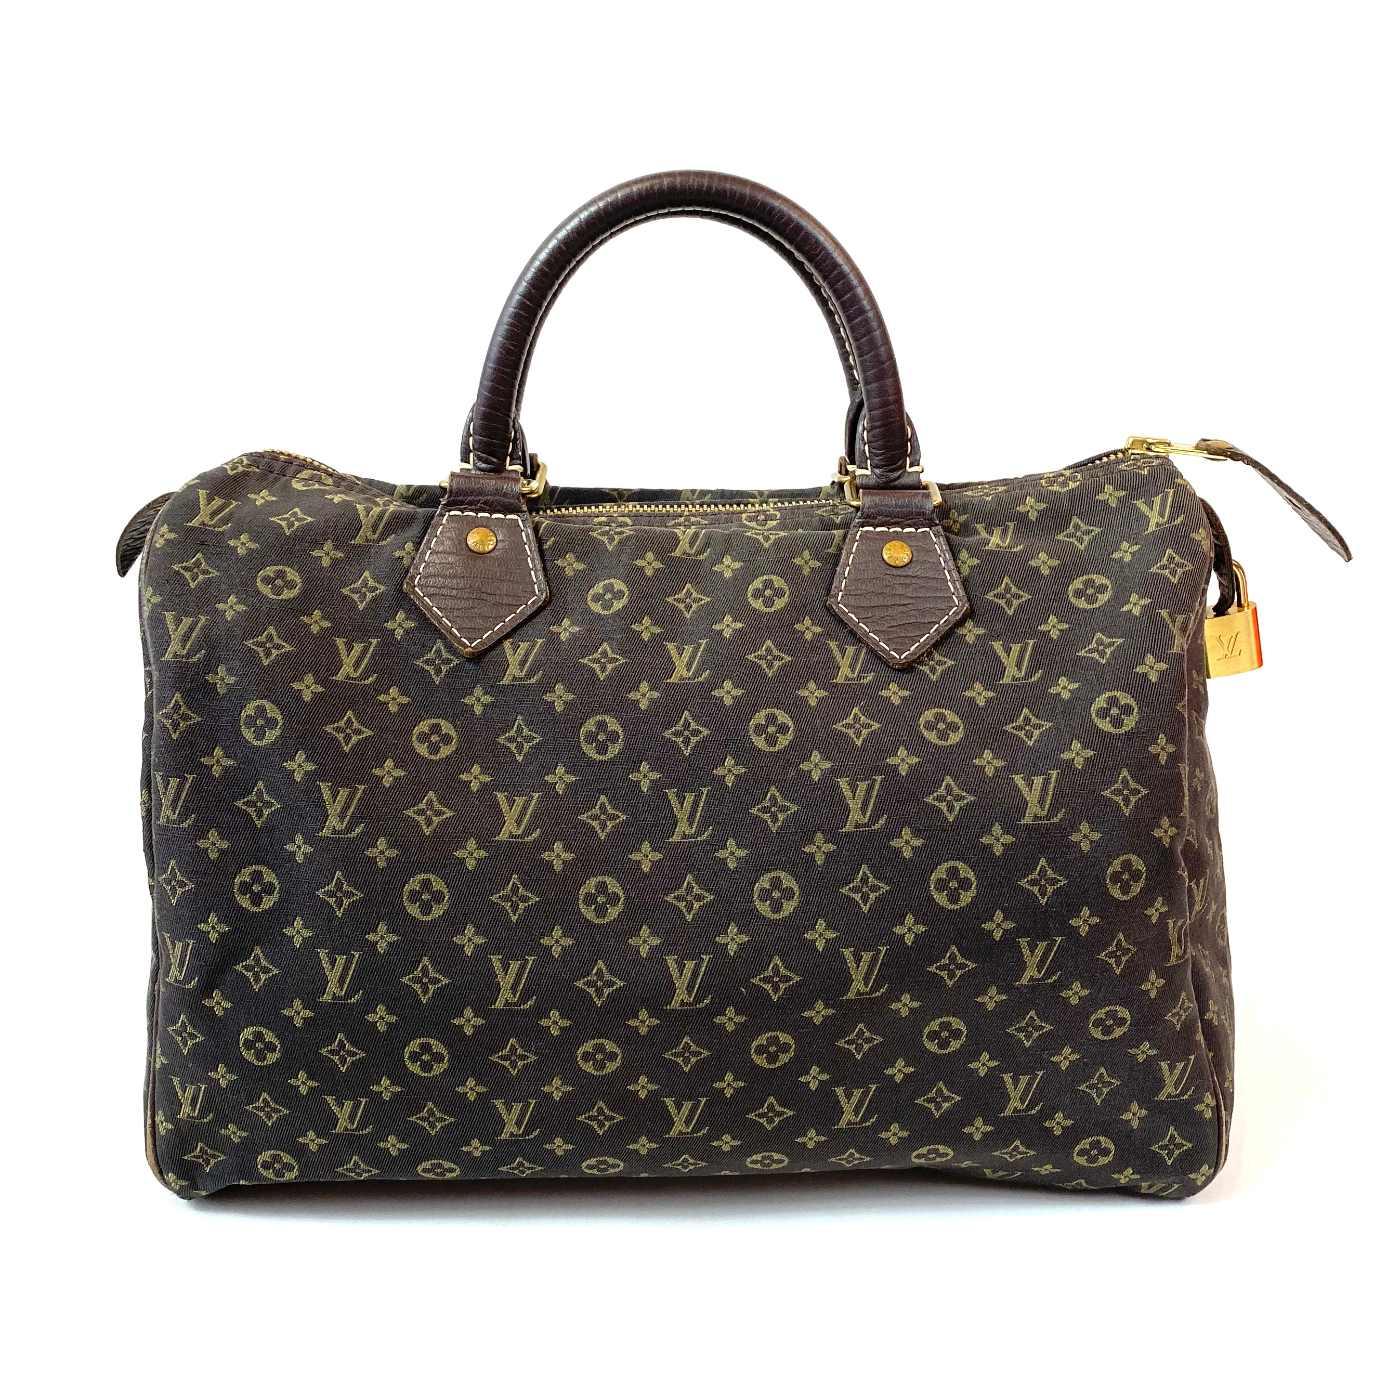 Bolsa Louis Vuitton Speedy 30 Mini Lin Damier Ebene